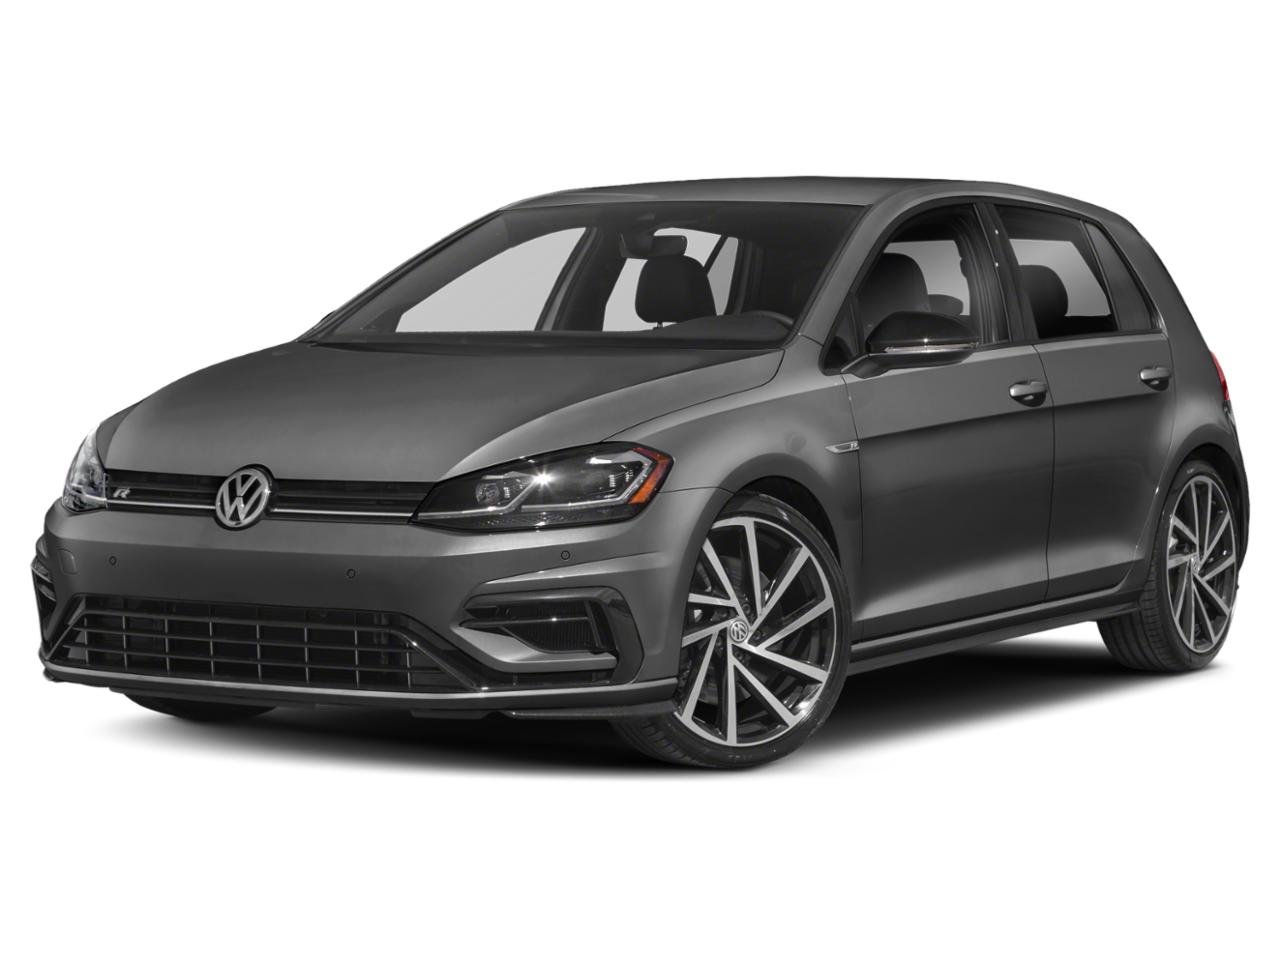 2018 Volkswagen Golf R Vehicle Photo in Plainfield, IL 60586